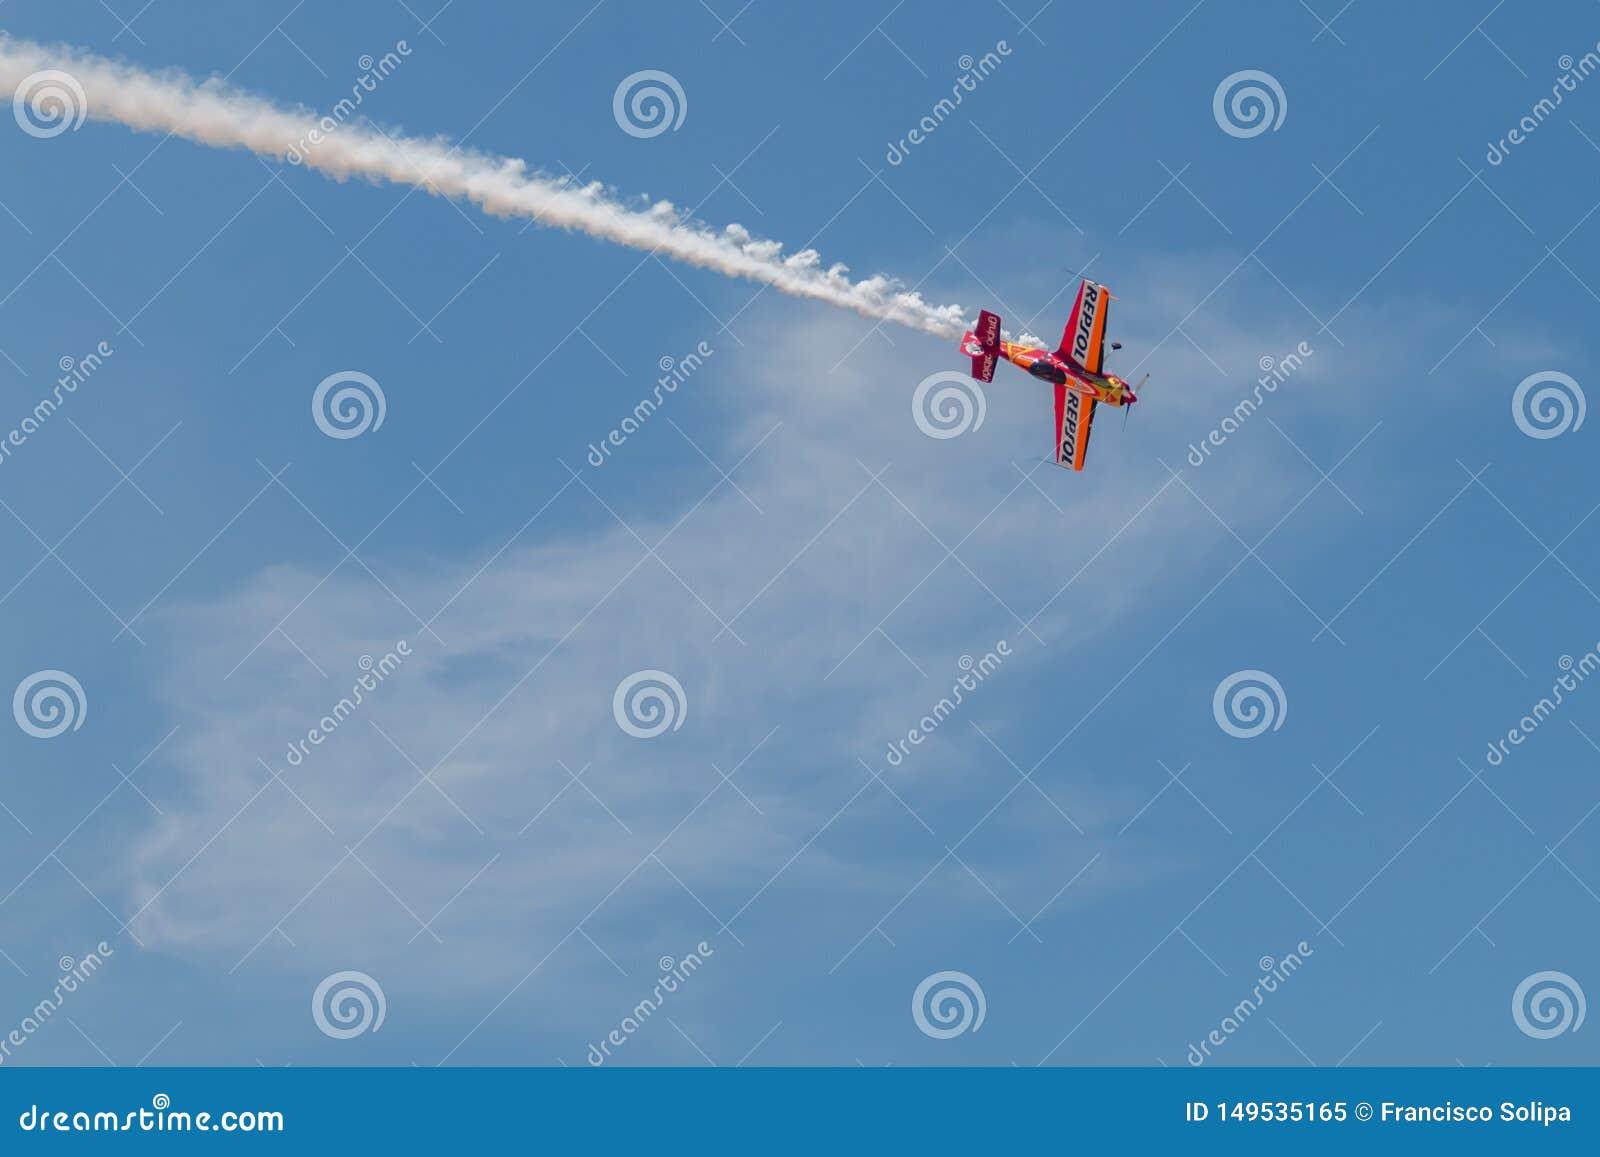 PONTE DE SOR, PORTUGAL - 3 JUNHO, 2019 : Air Show, pilot in flight action. PORTUGAL AIR SUMMIT